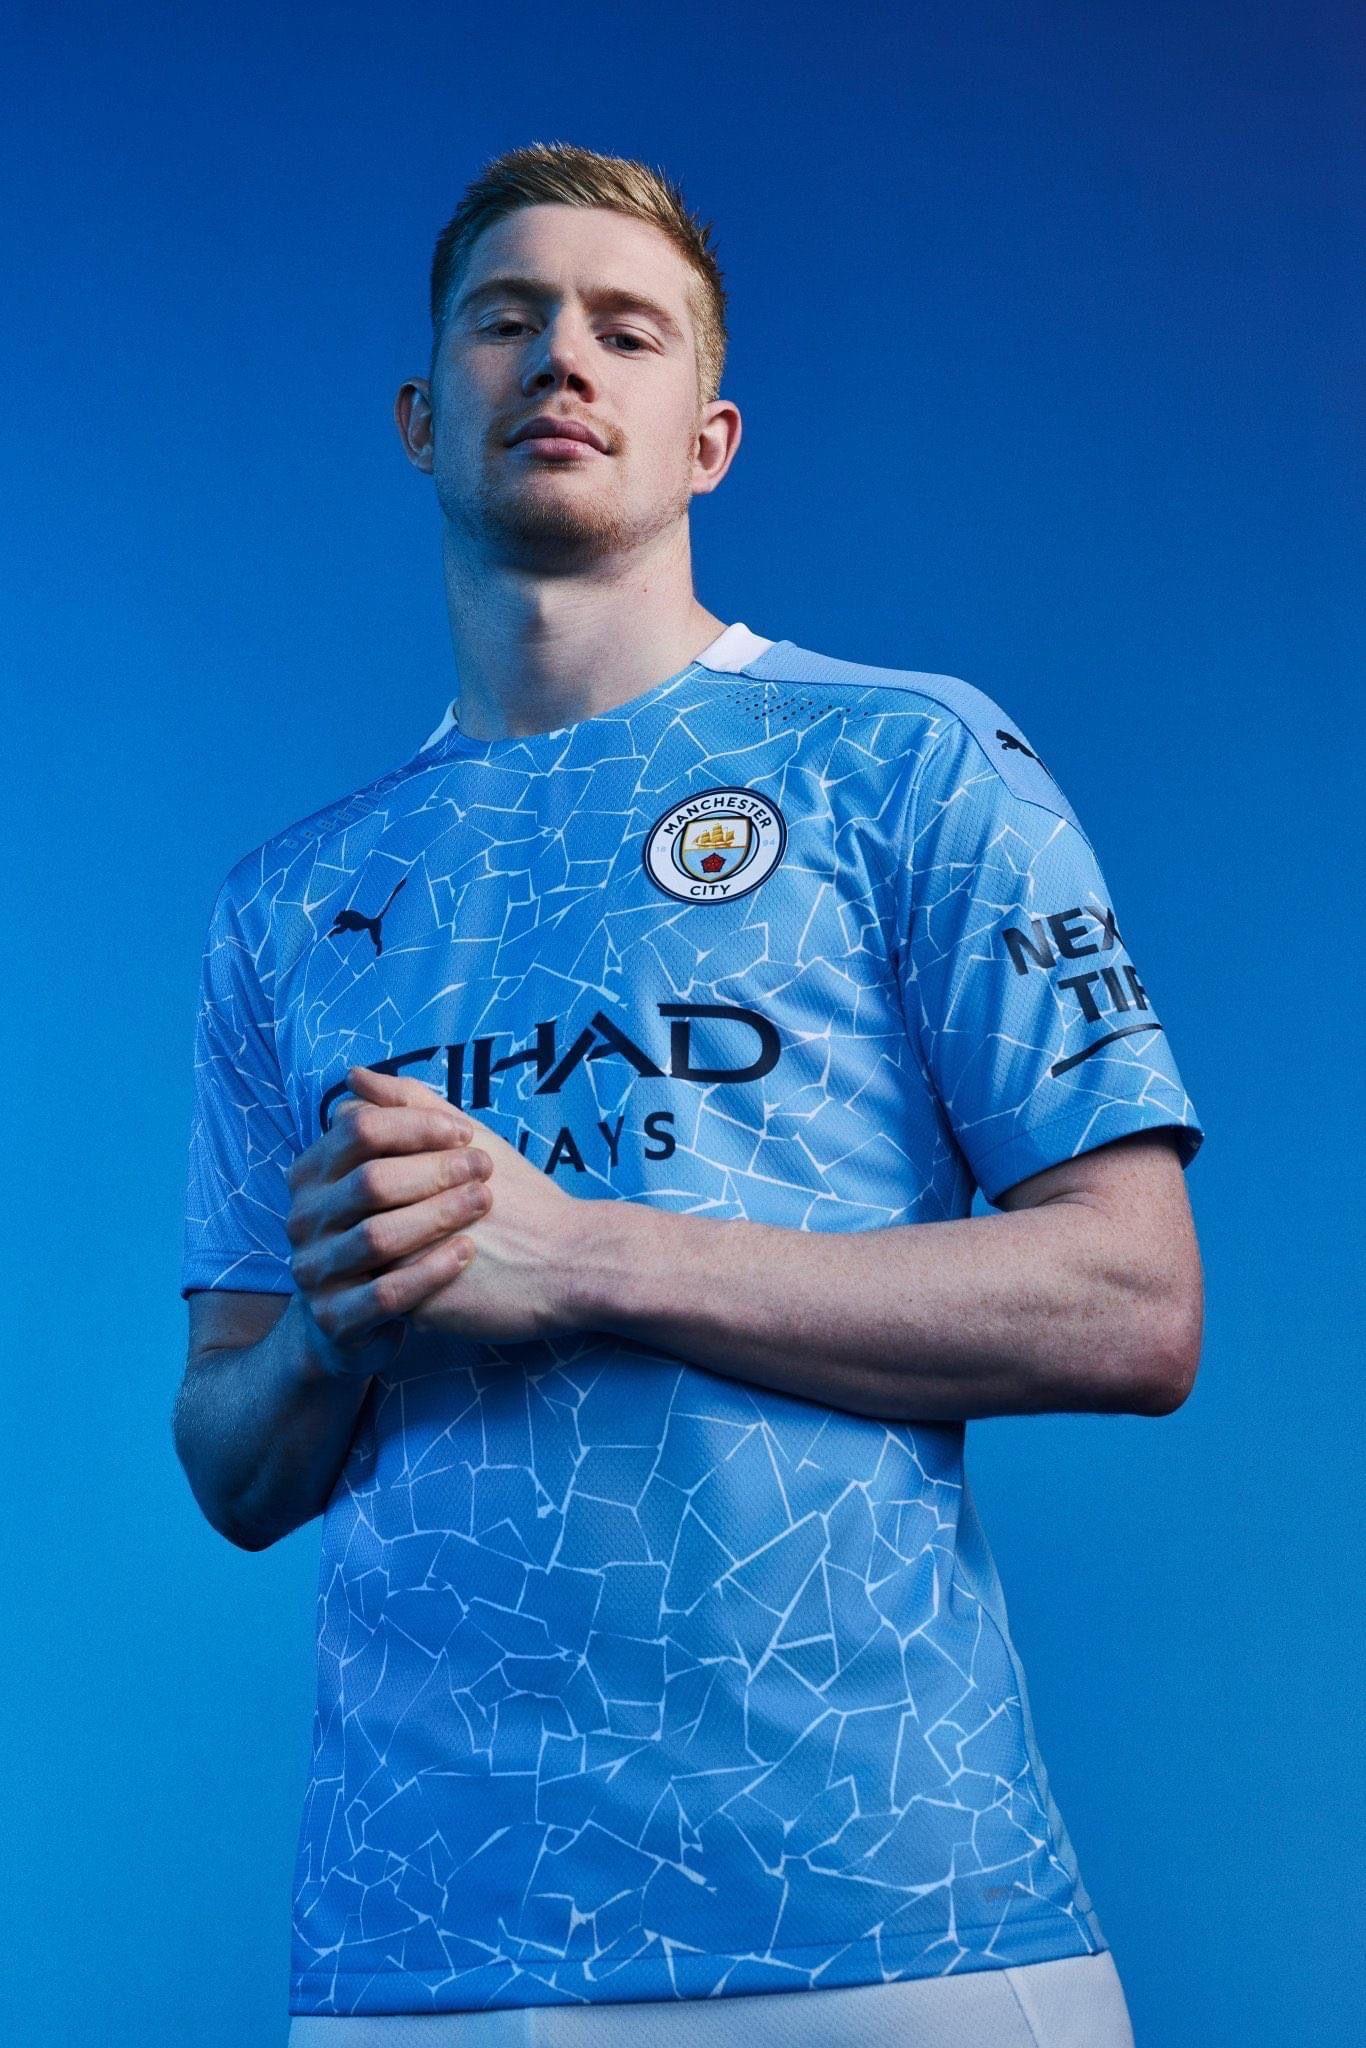 Mcfc 2020 2021 Home Kit Manchester City Manchester City Wallpaper Manchester City Football Club